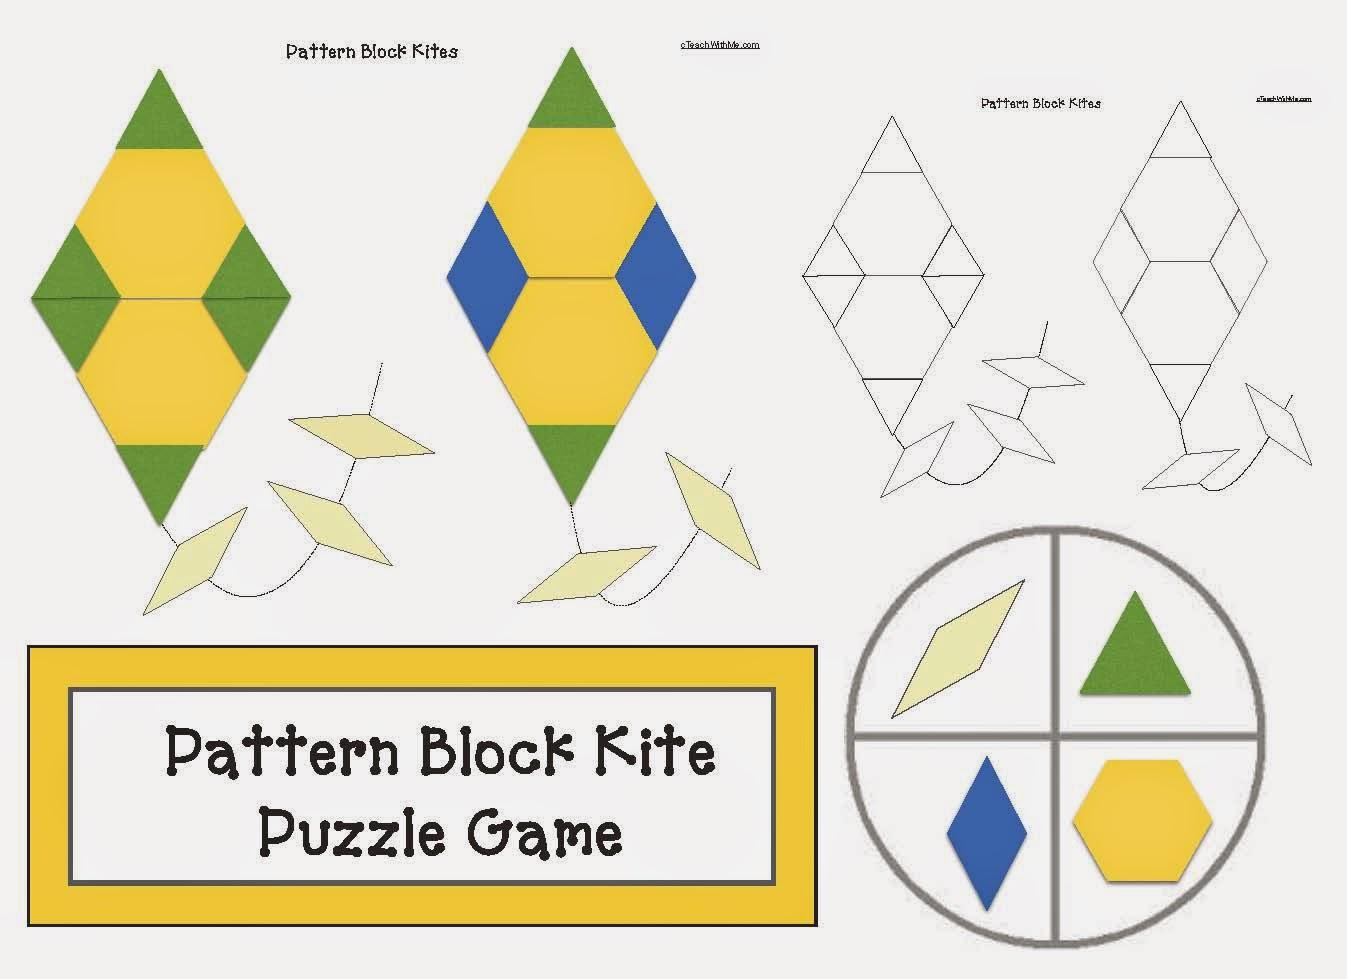 http://4.bp.blogspot.com/-rsky0KfBrNY/VQbXBeGT2wI/AAAAAAAANvI/AE1IgCsfmJE/s1600/pattern%2Bblock%2Bkite%2Bpuzzle%2Bgame%2Bcov.jpg